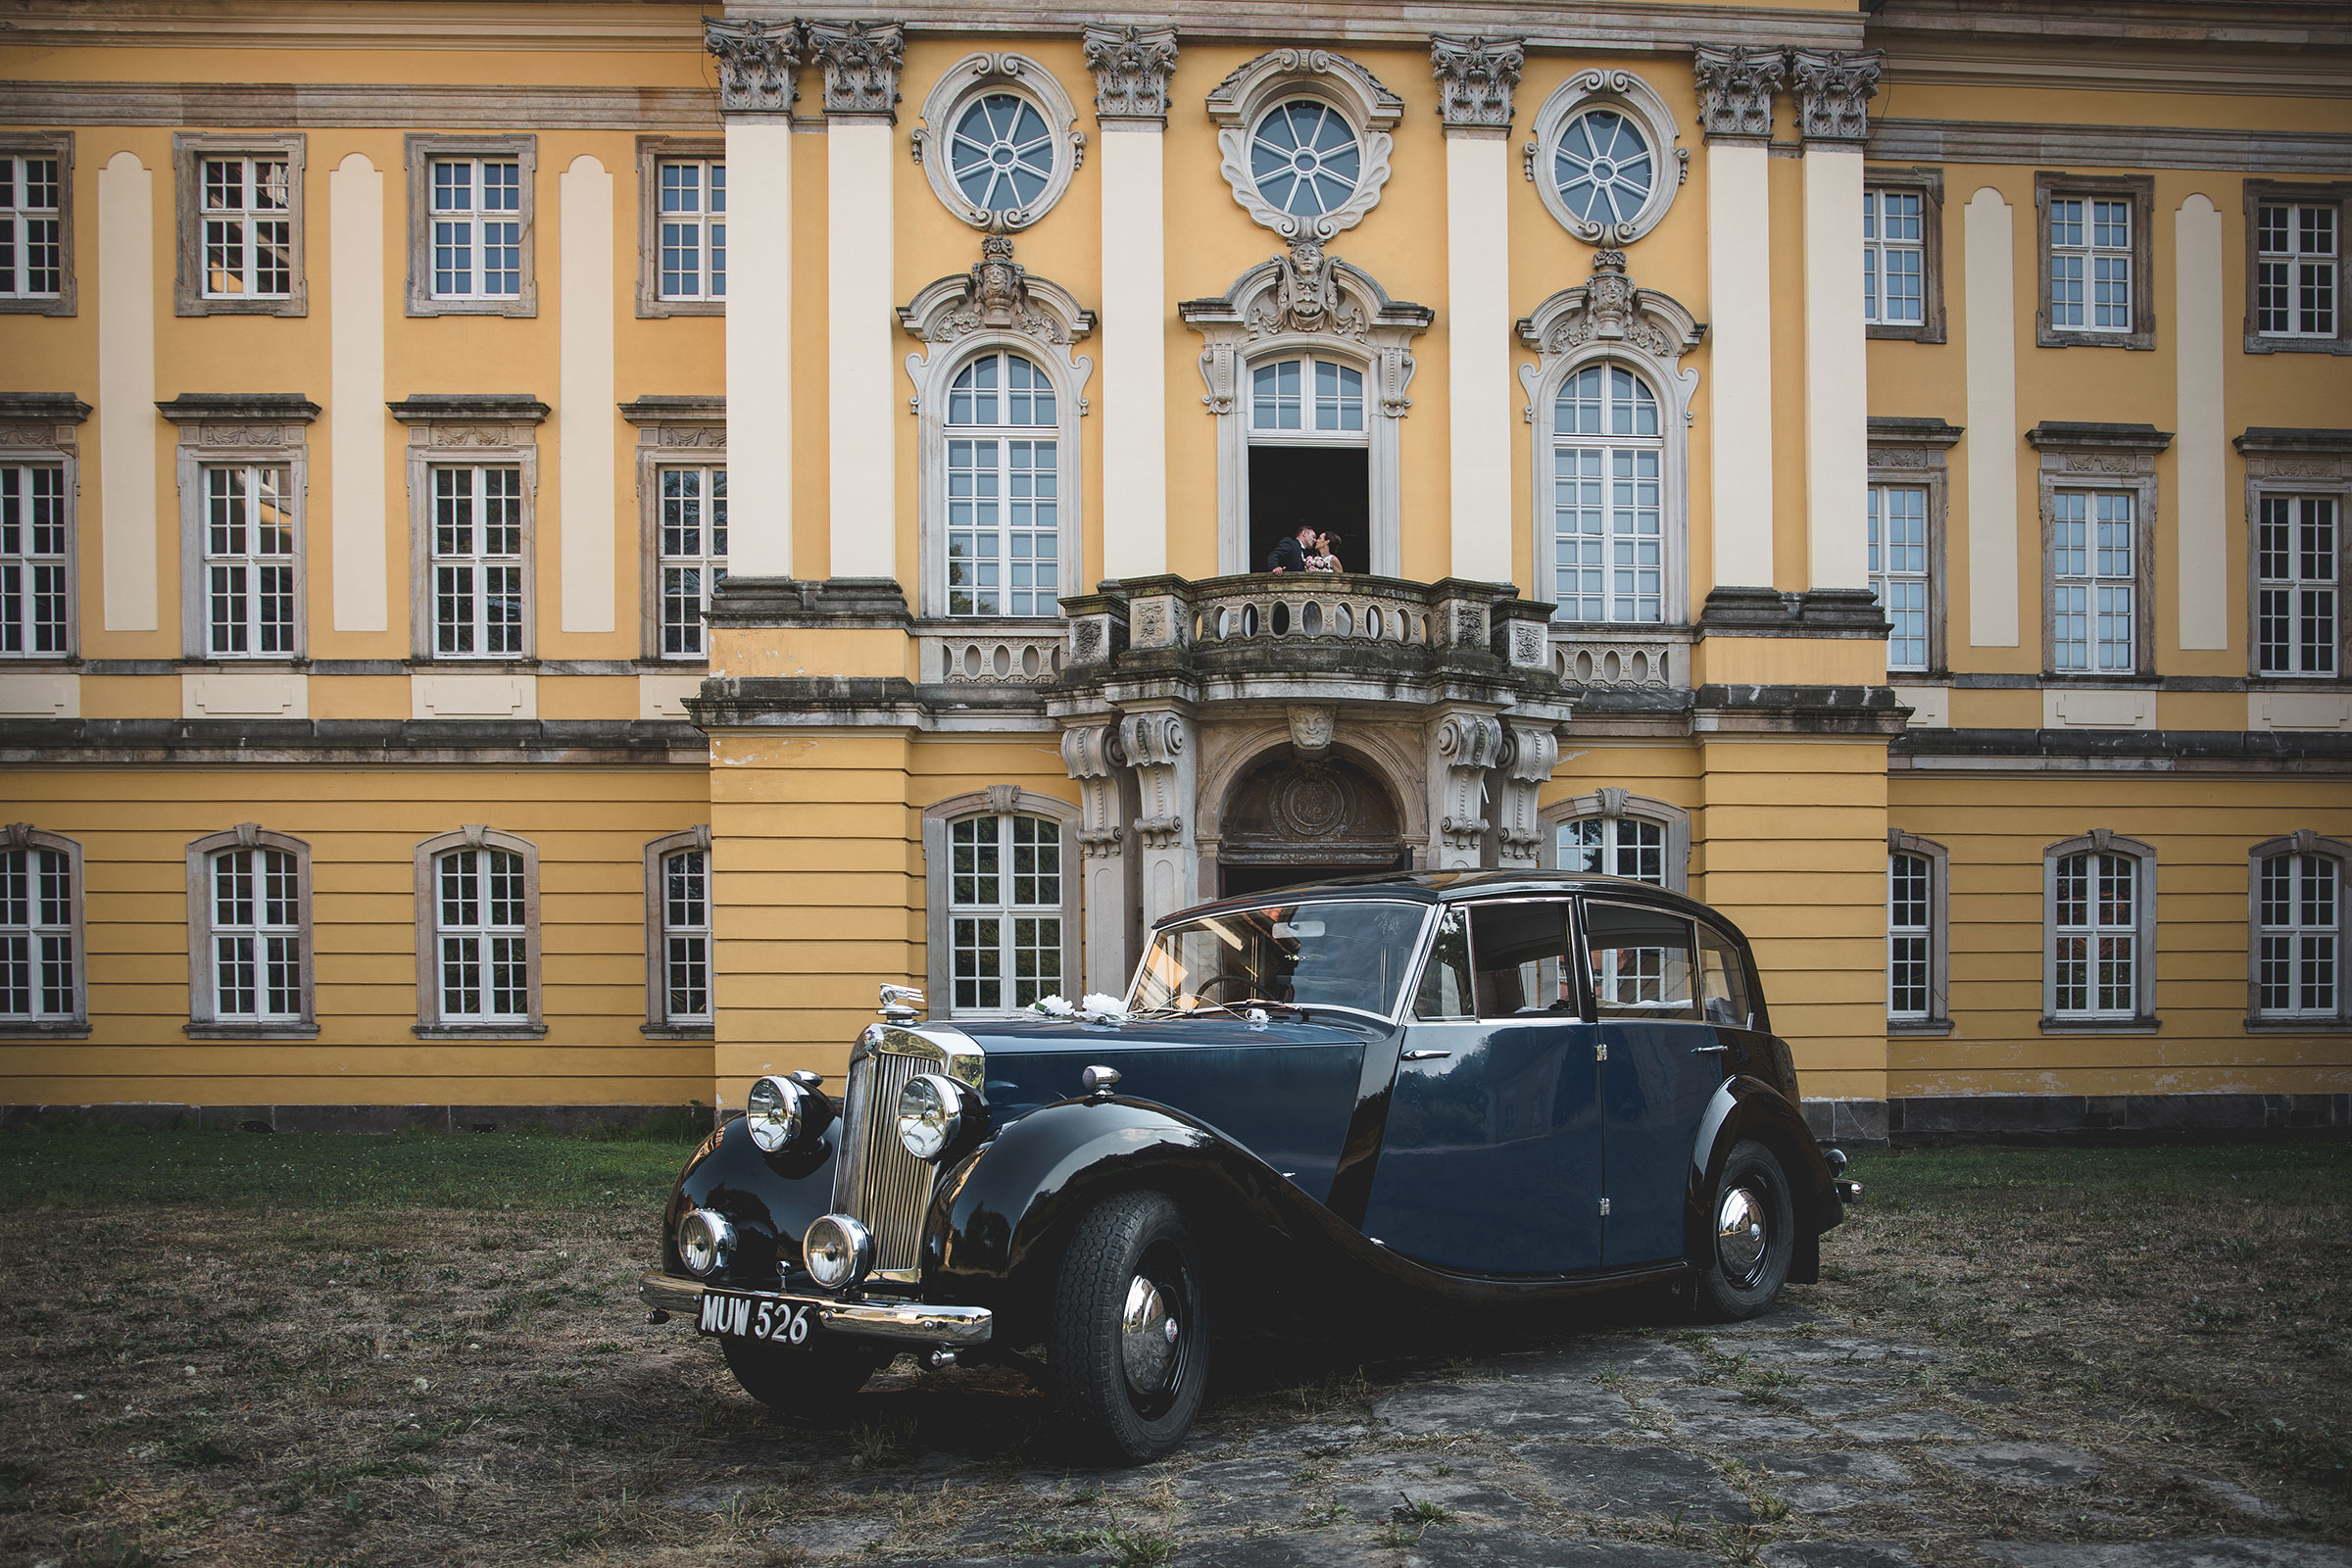 Juweleria_Navratiel_Hochzeit_Auto